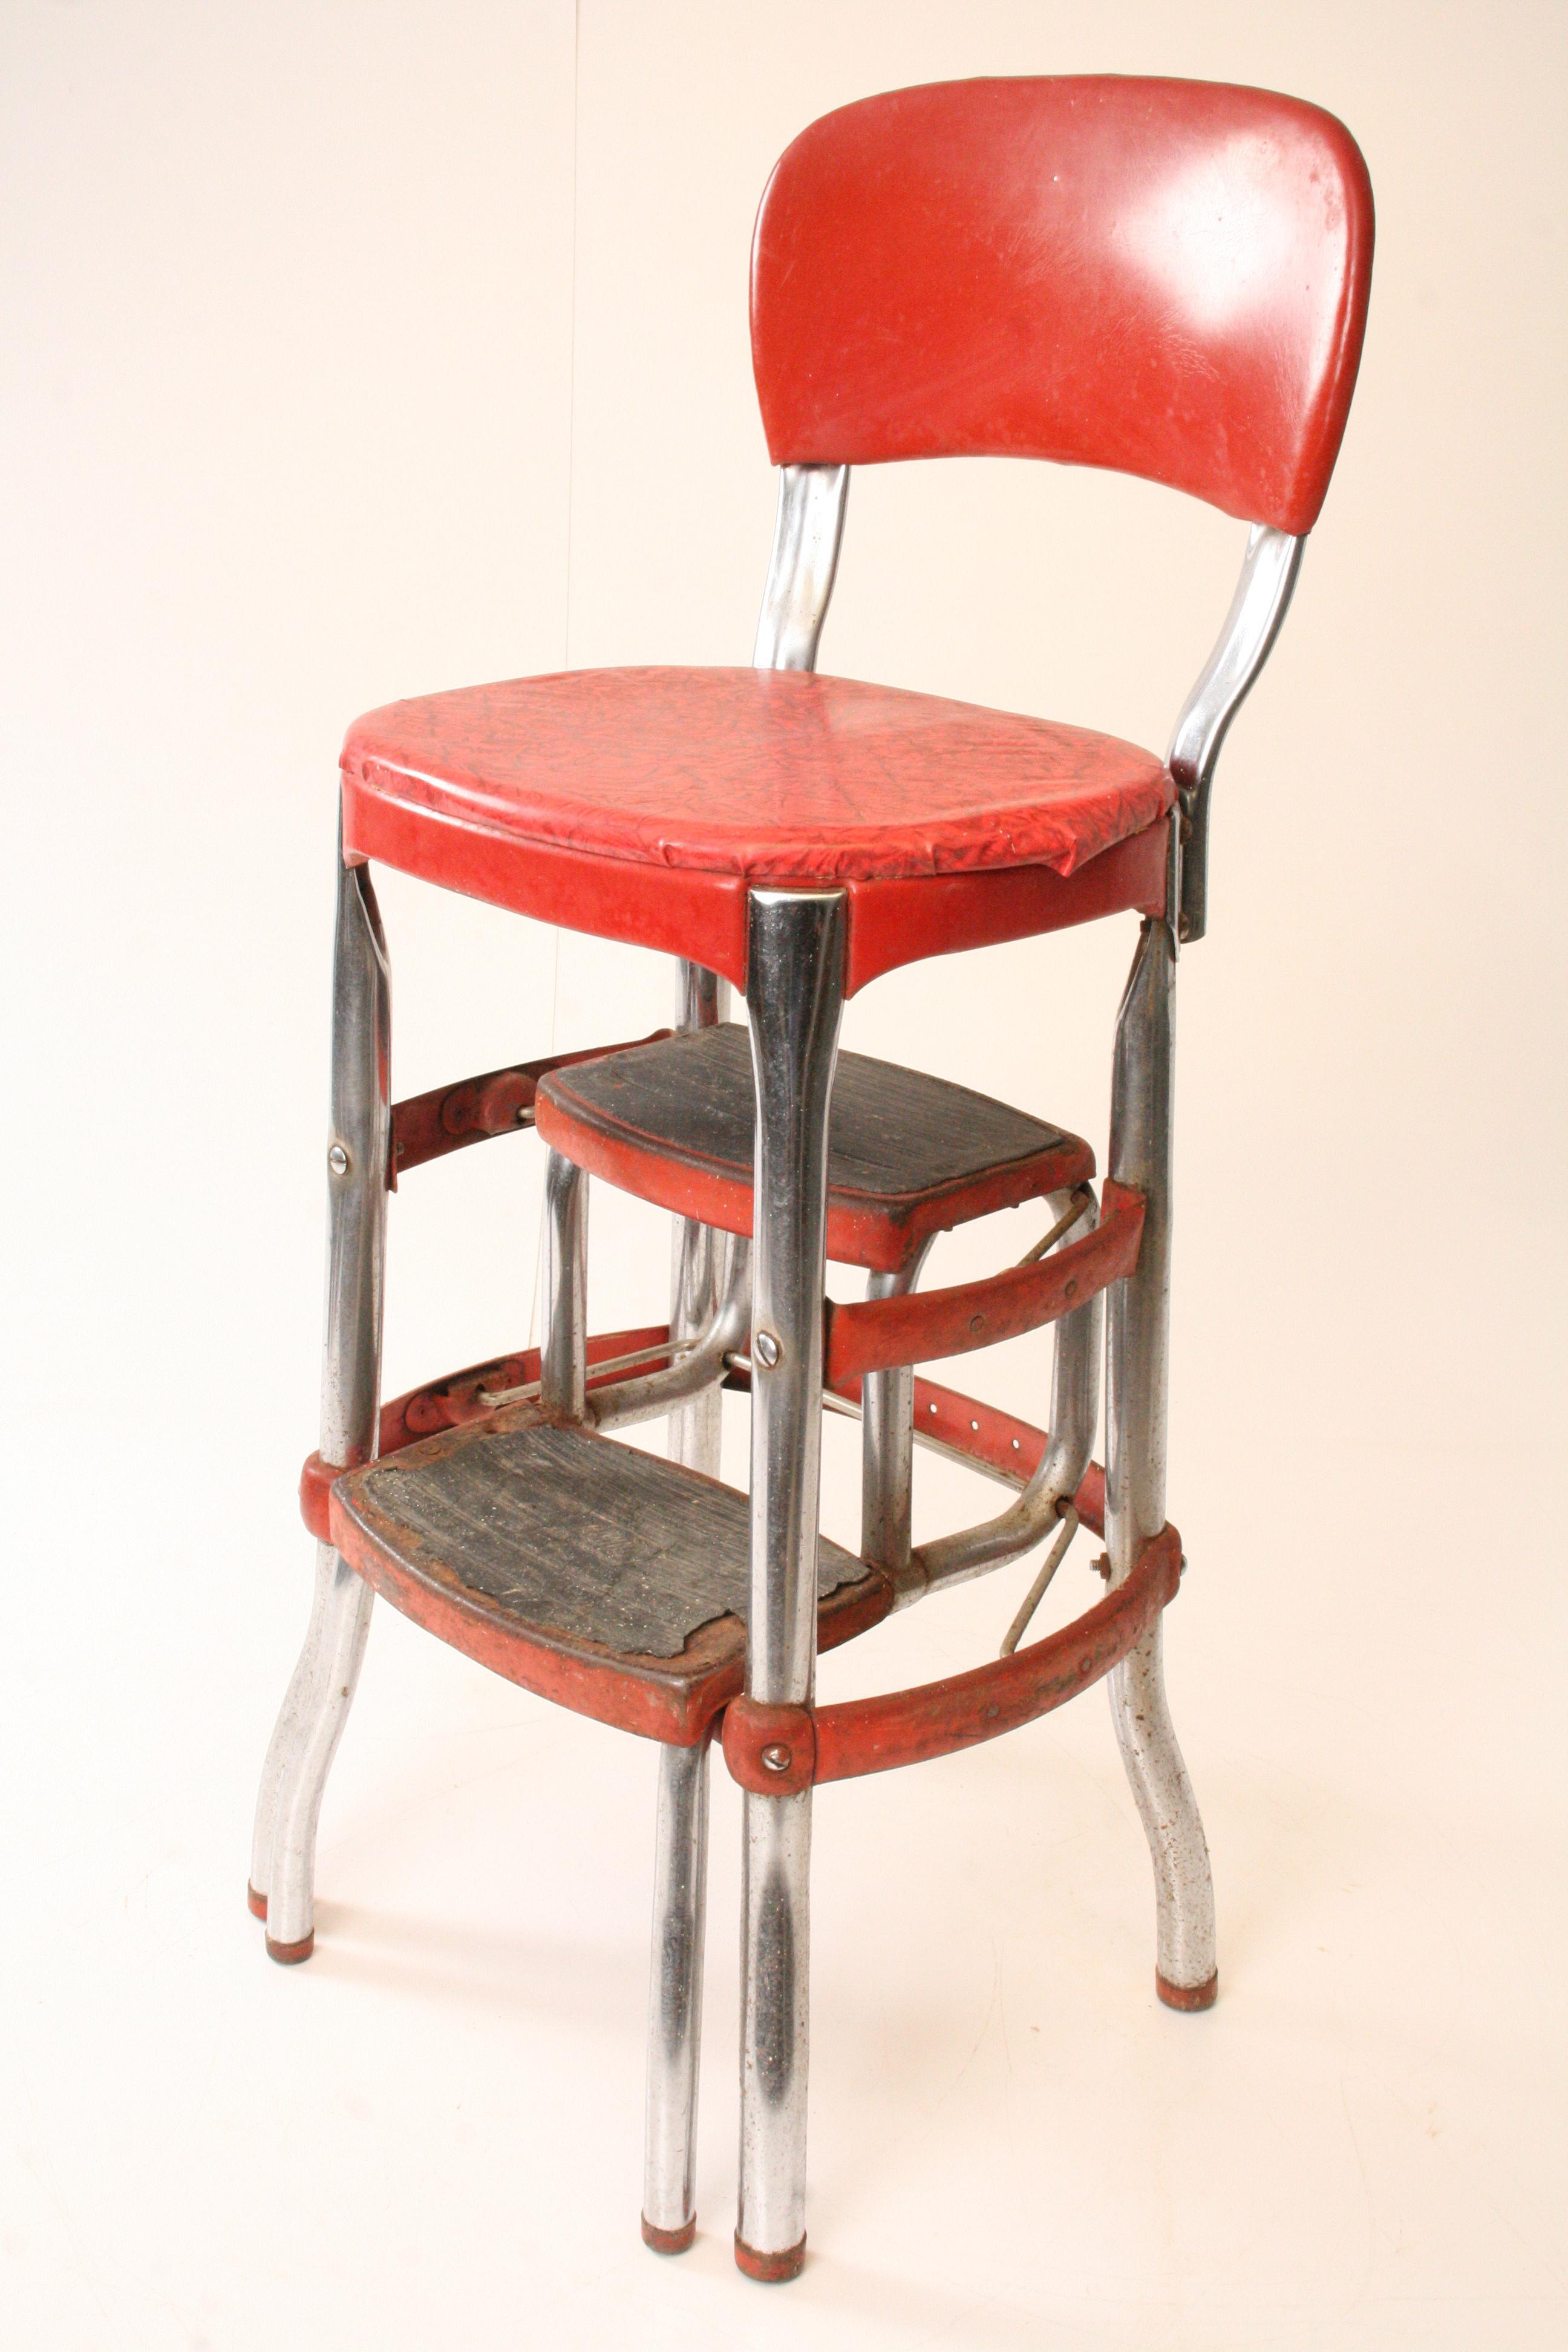 Cosco Mid Century Red Metal Step Stool Chairish